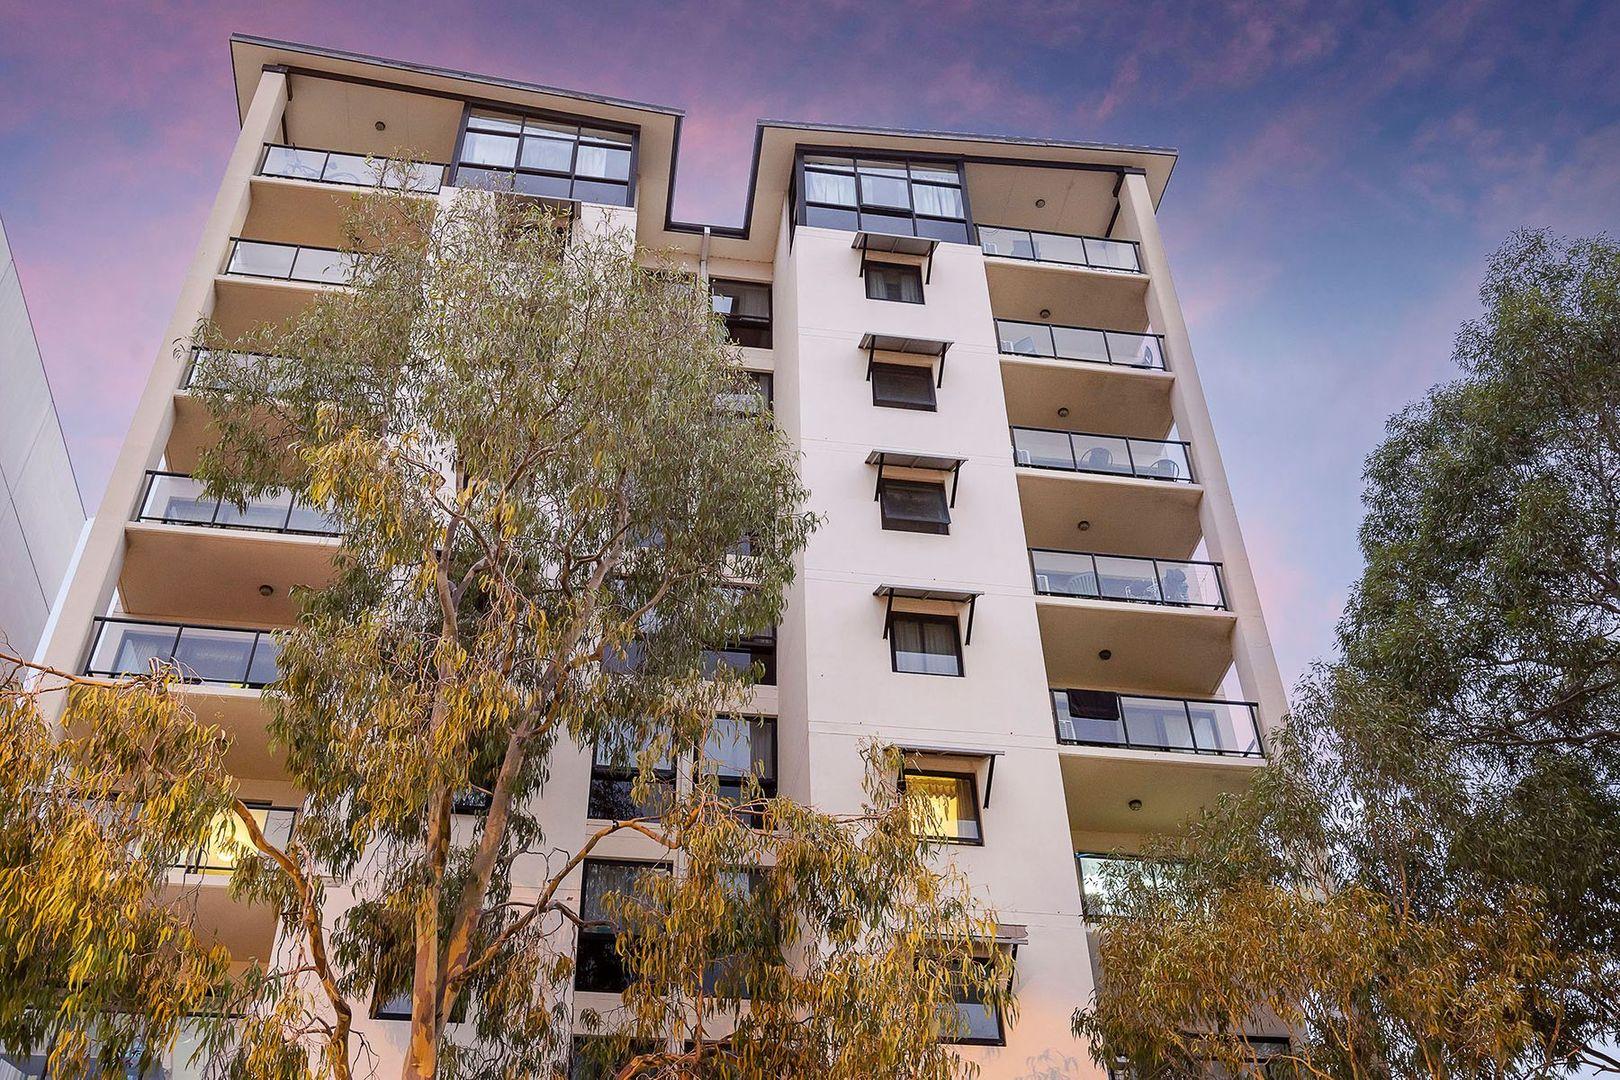 2/273 Hay Street, East Perth WA 6004, Image 1